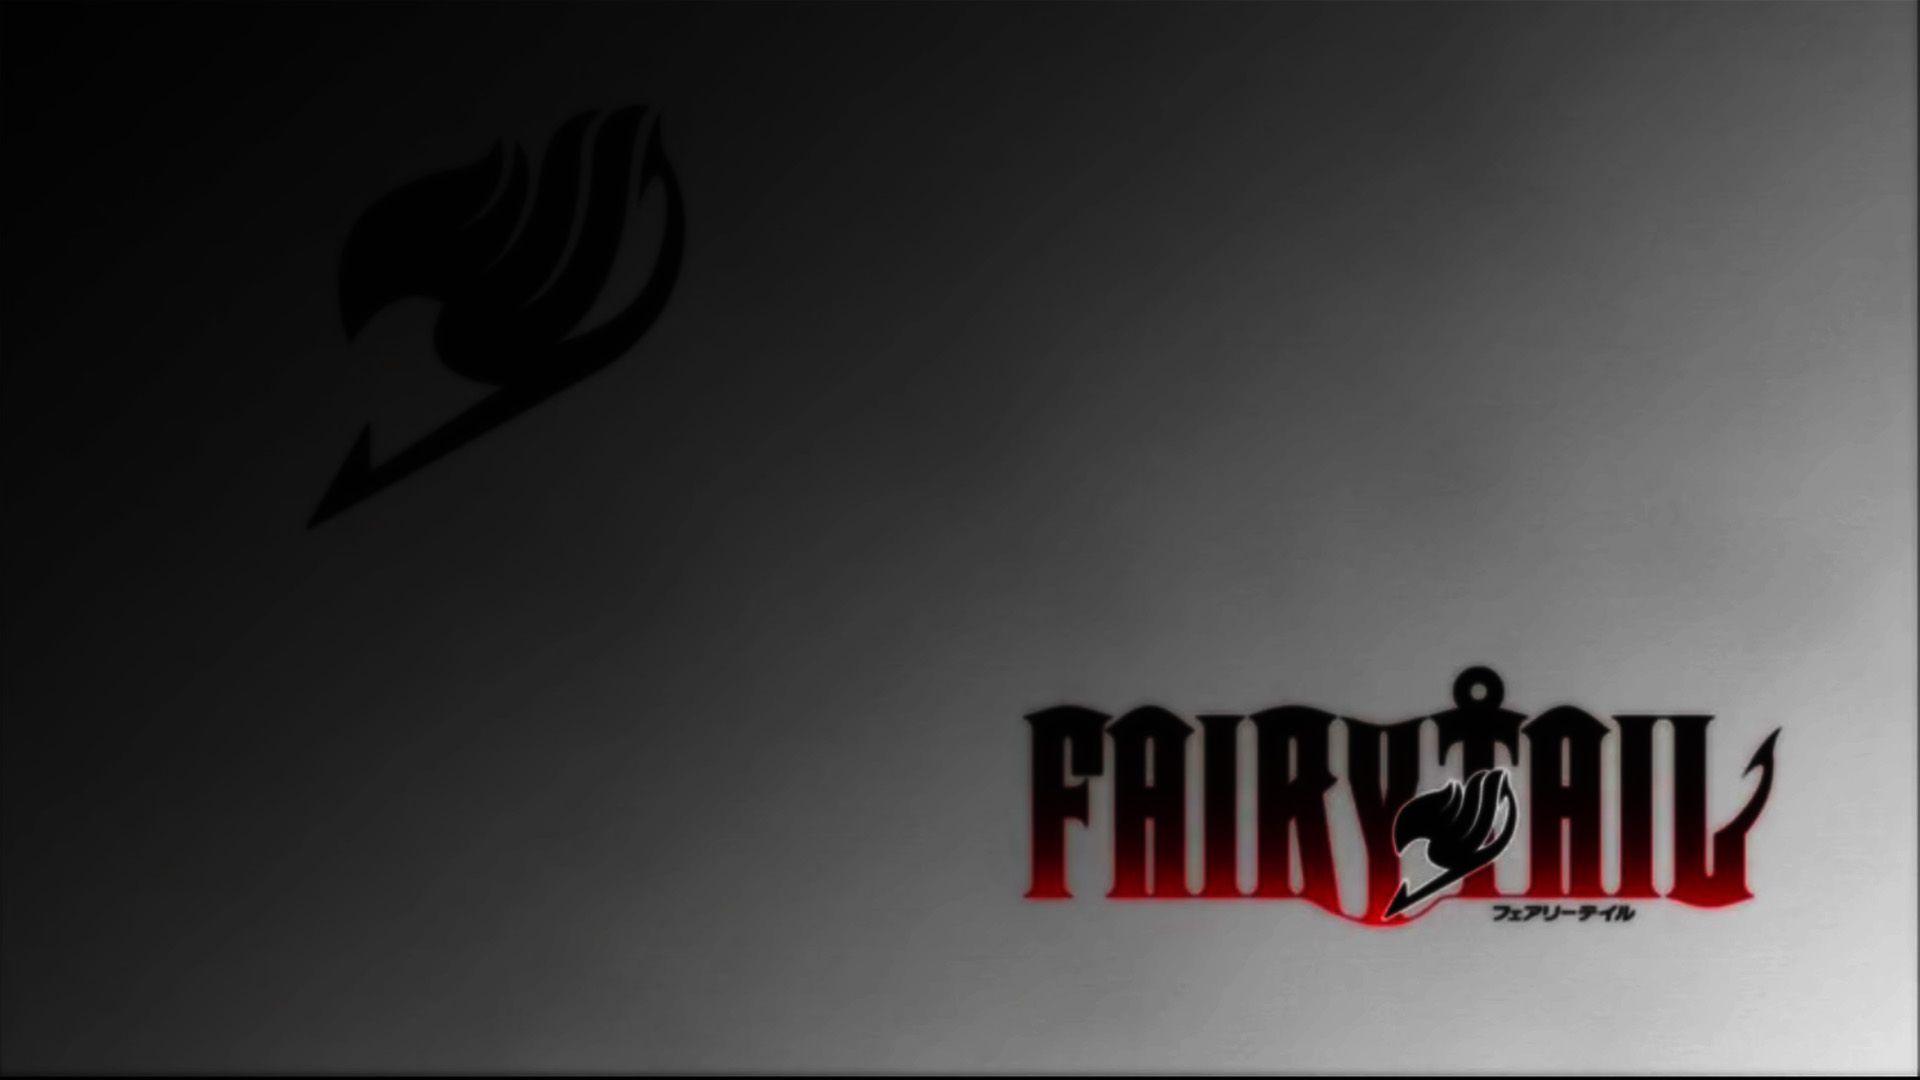 Fairy Tail Manga Wallpapers Desktop Group (64+)